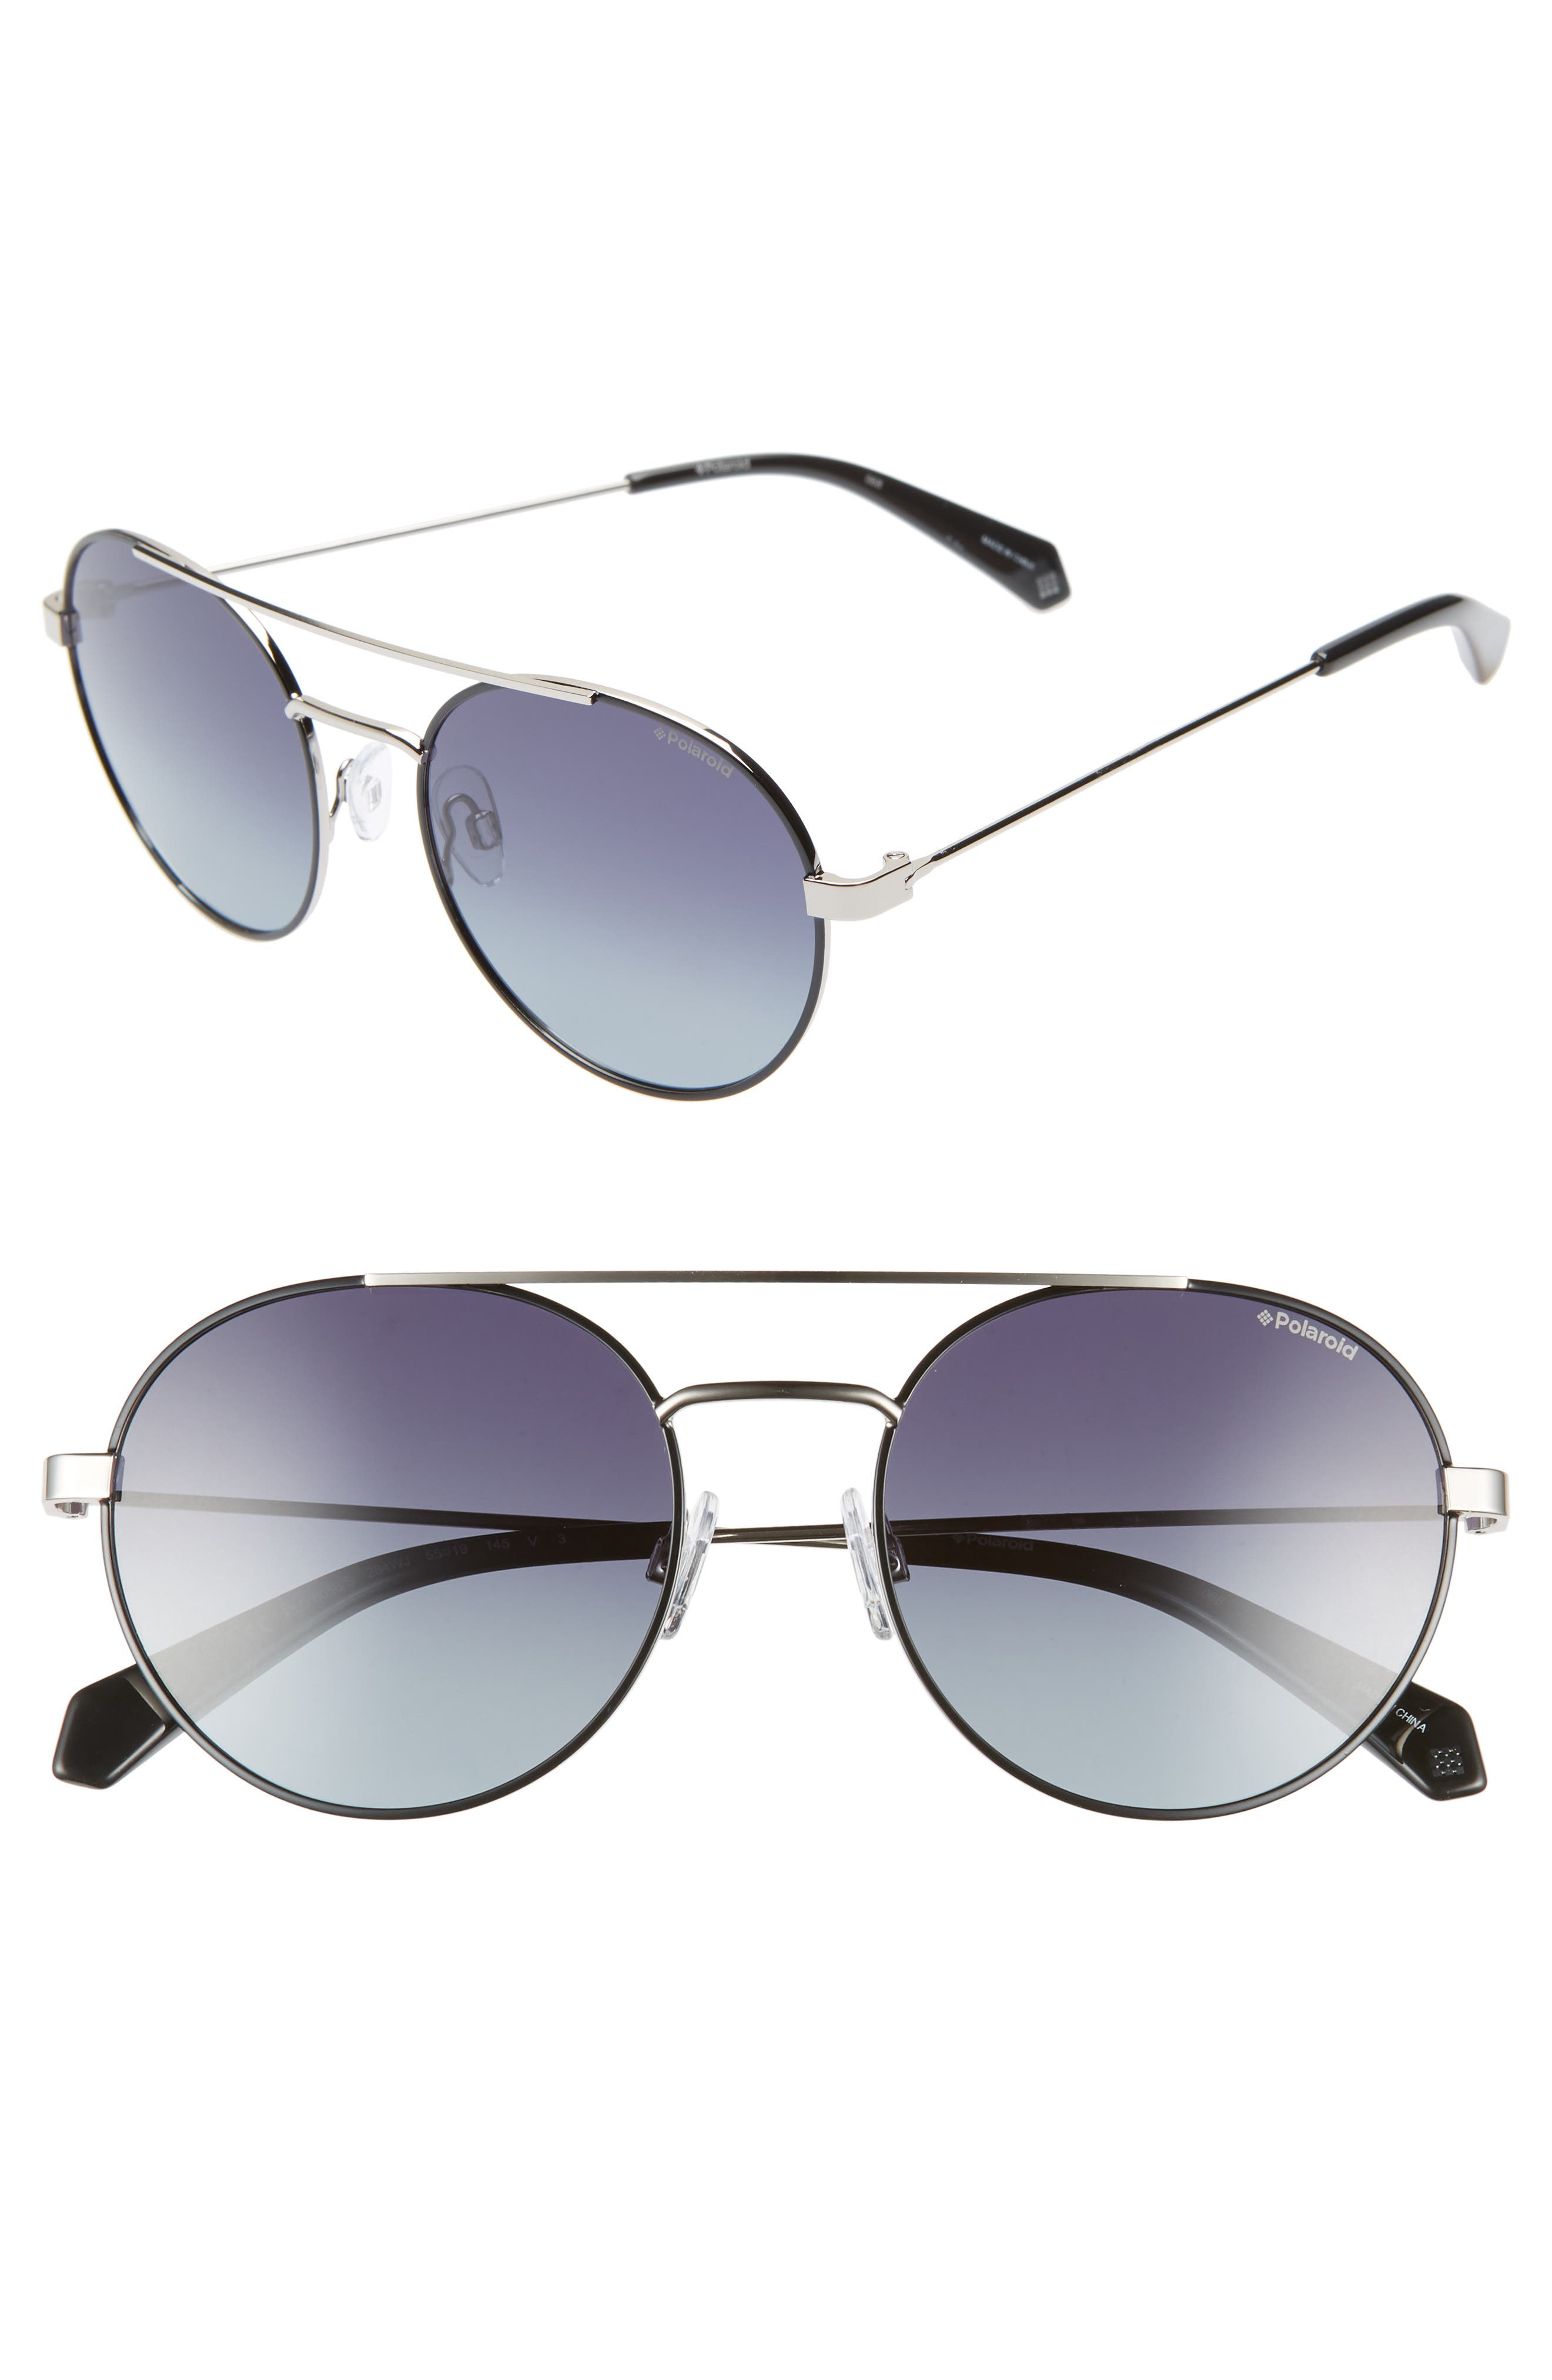 POLAROID EYEWEAR,                             Polaroid 55mm Polarized Round Aviator Sunglasses,                             Main thumbnail 1, color,                             BLACK RUTHENIUM